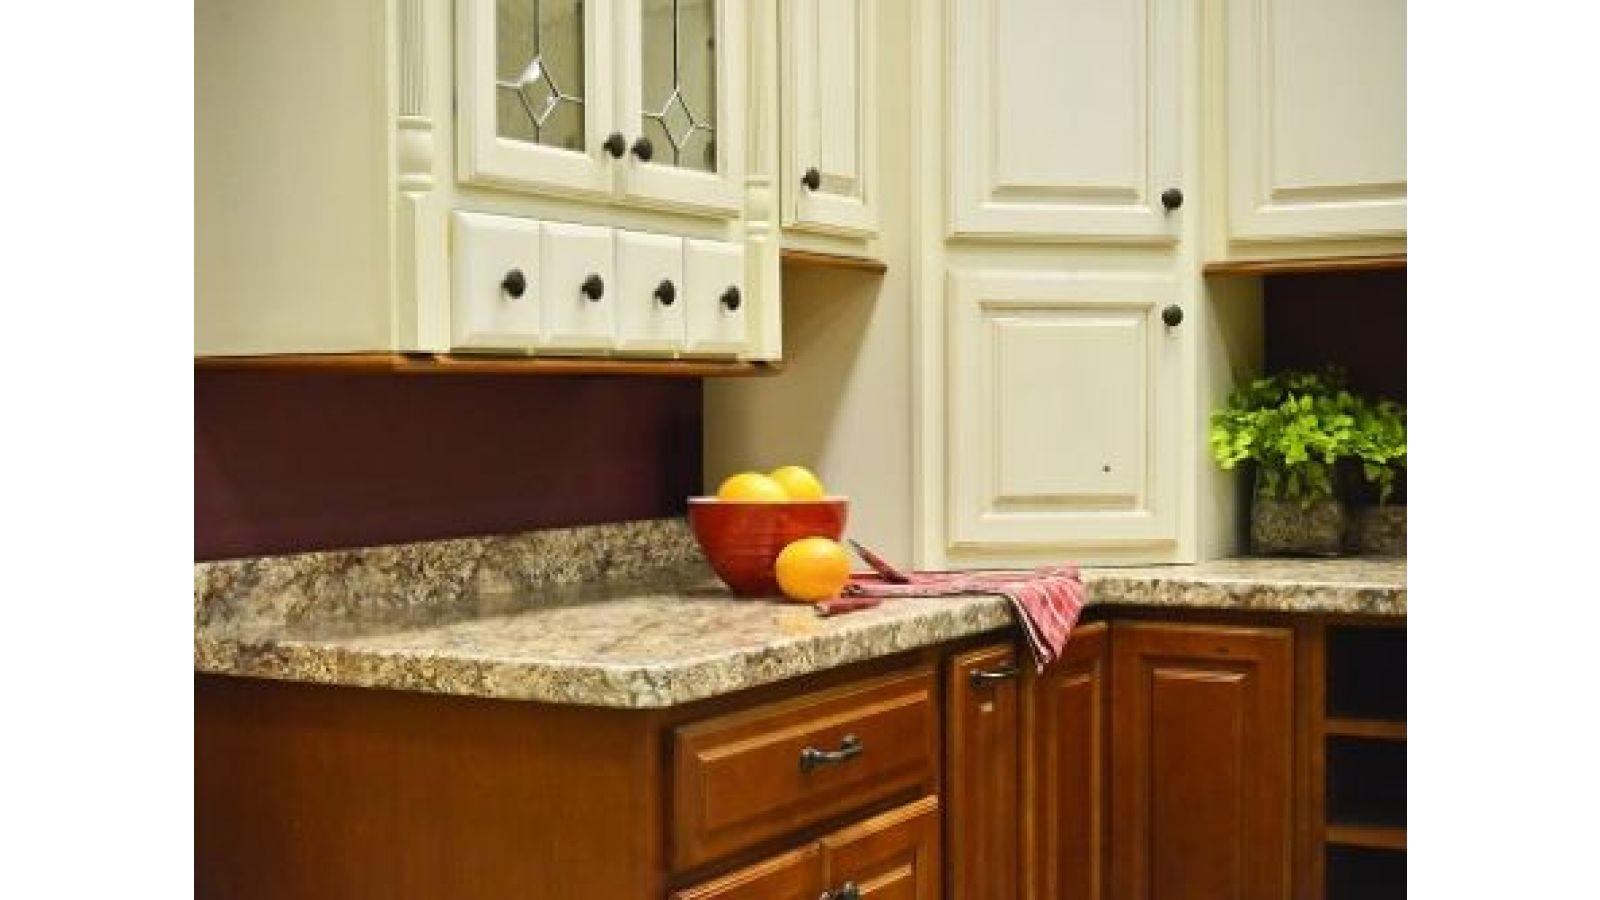 Caspian Kitchen Countertop by Hartson-Kennedy Cabinet Top Co., Inc.